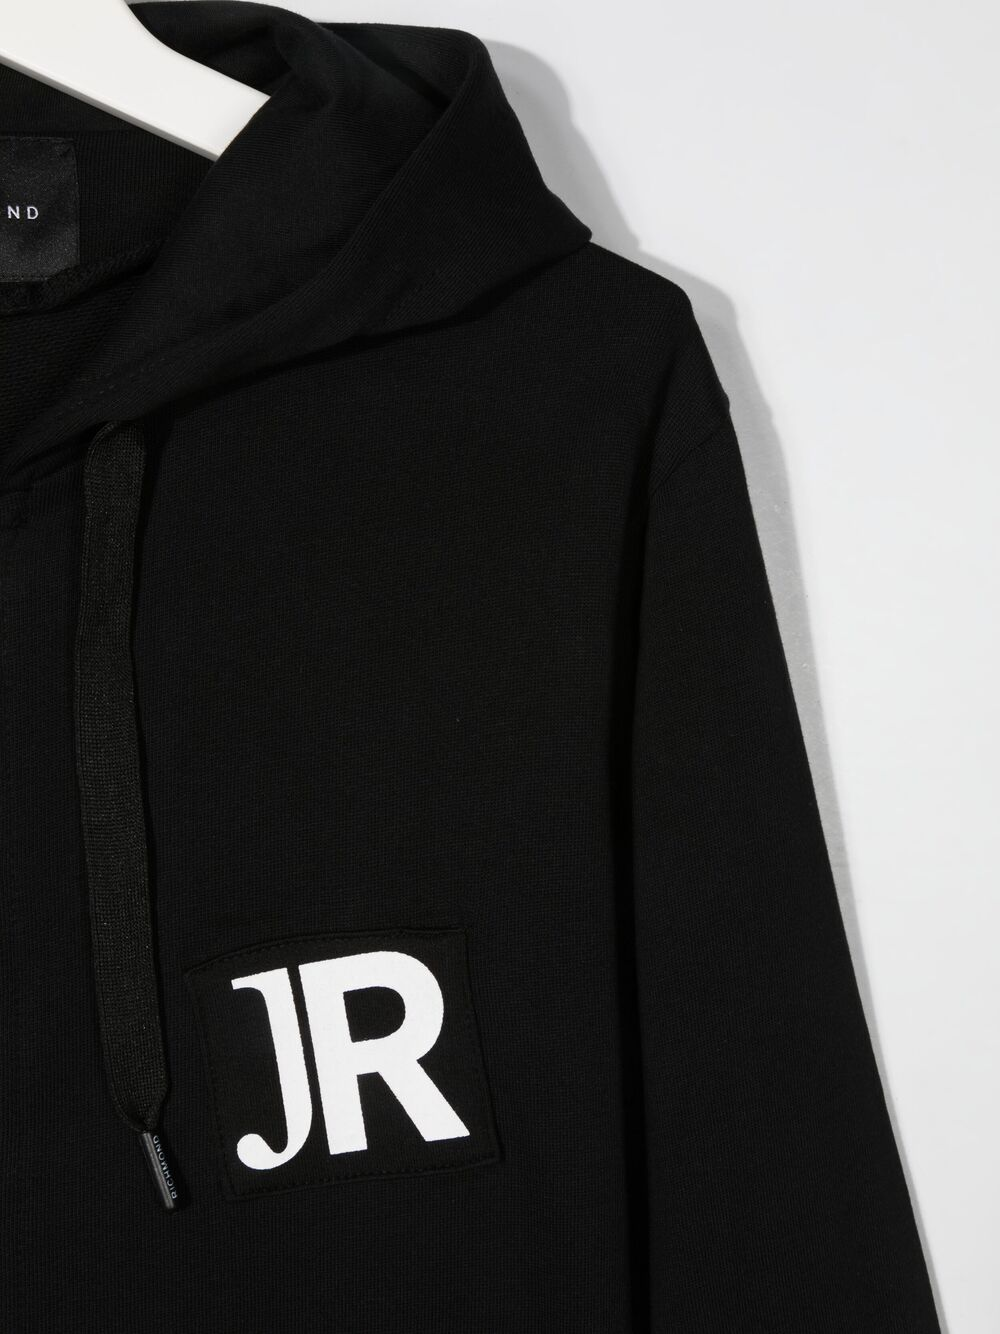 john richmond felpa aperta cappuccio con stampa john richmond | Felpa | RBP21087FEW0148T